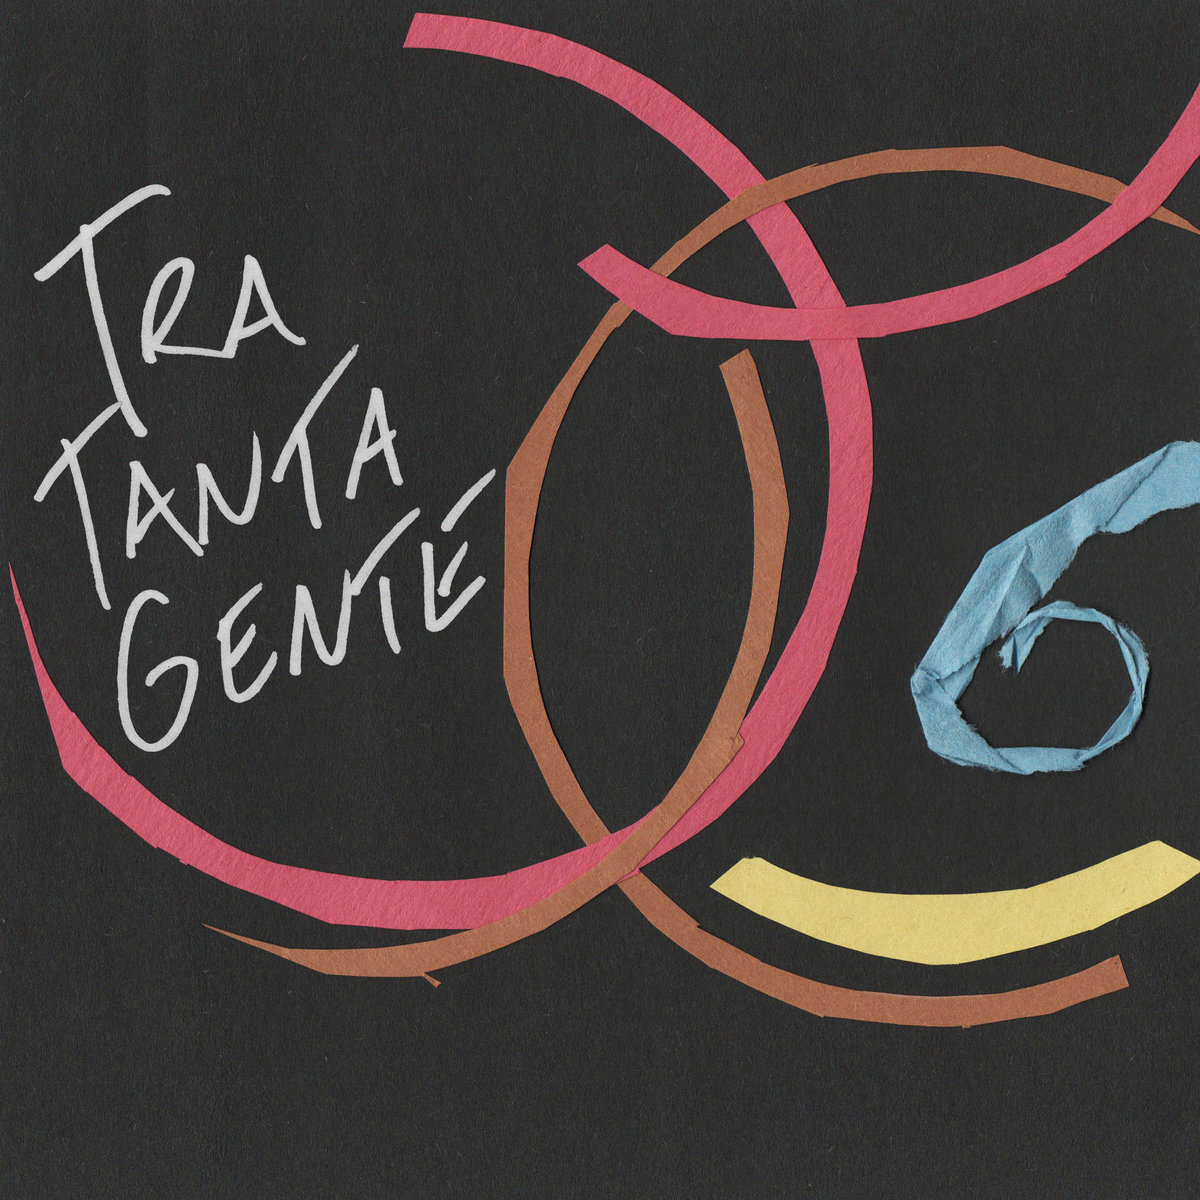 Tra Tanta Gente by Morricone 90